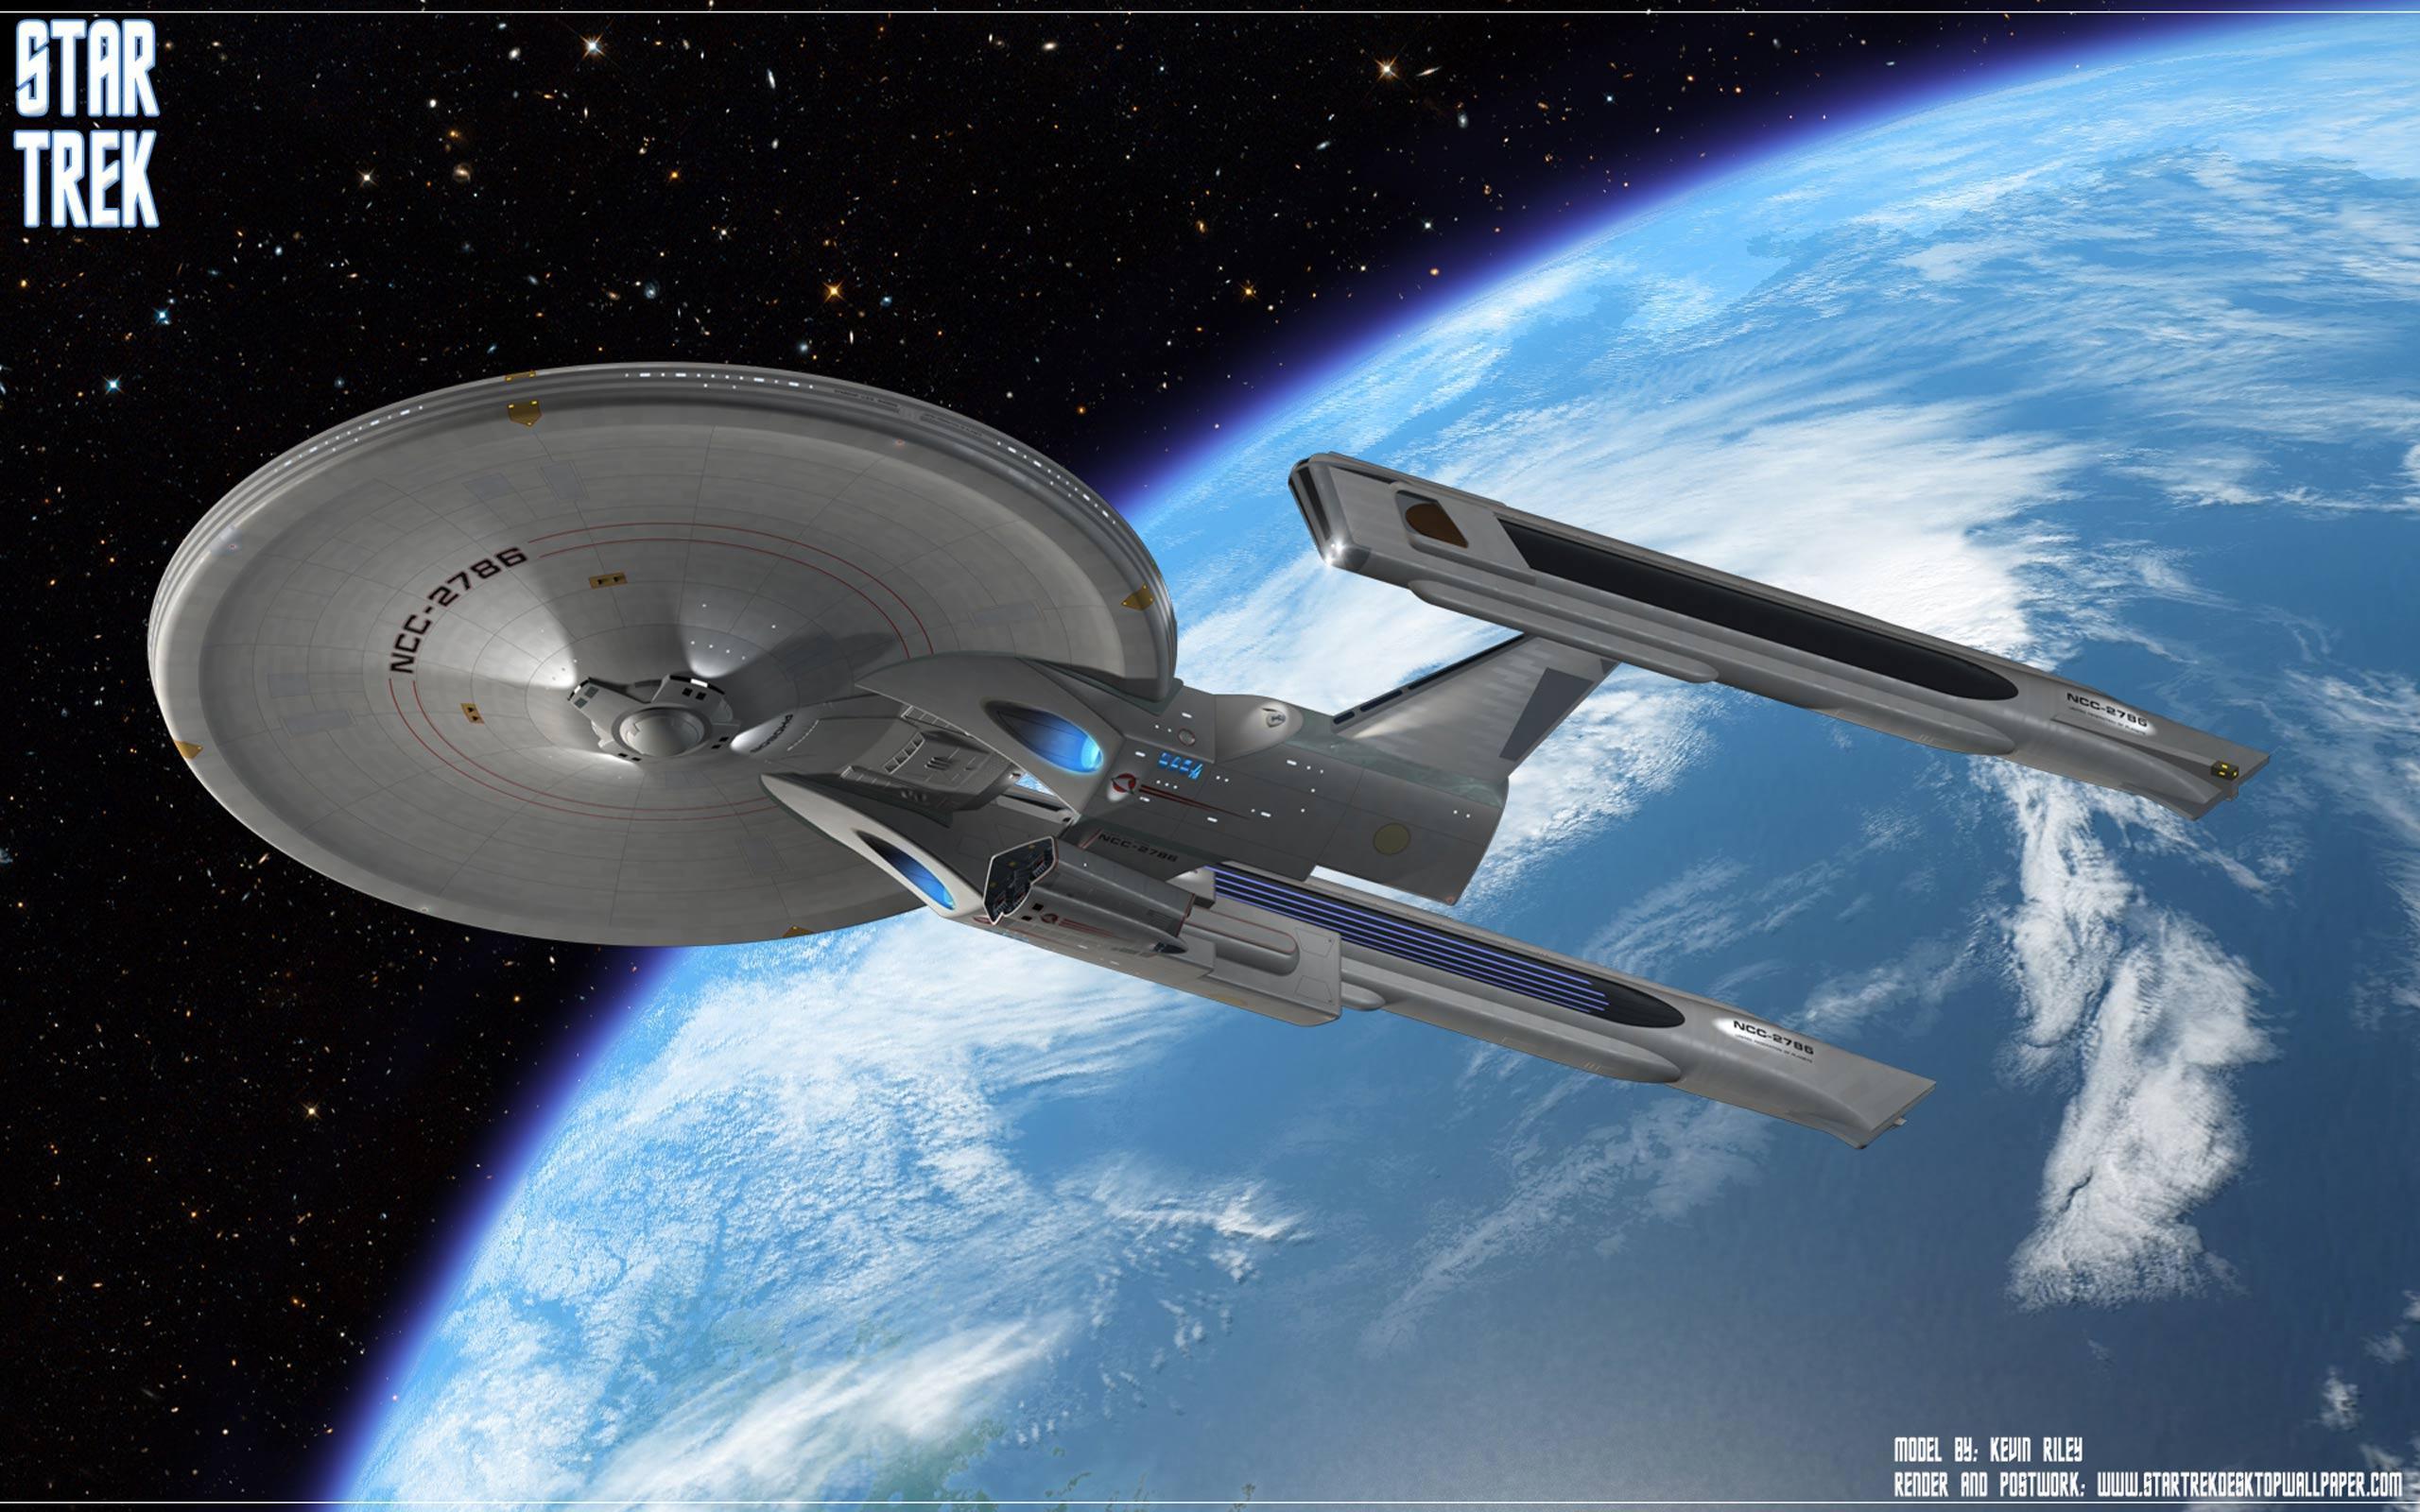 Star Trek Ships Wallpapers 2560x1600